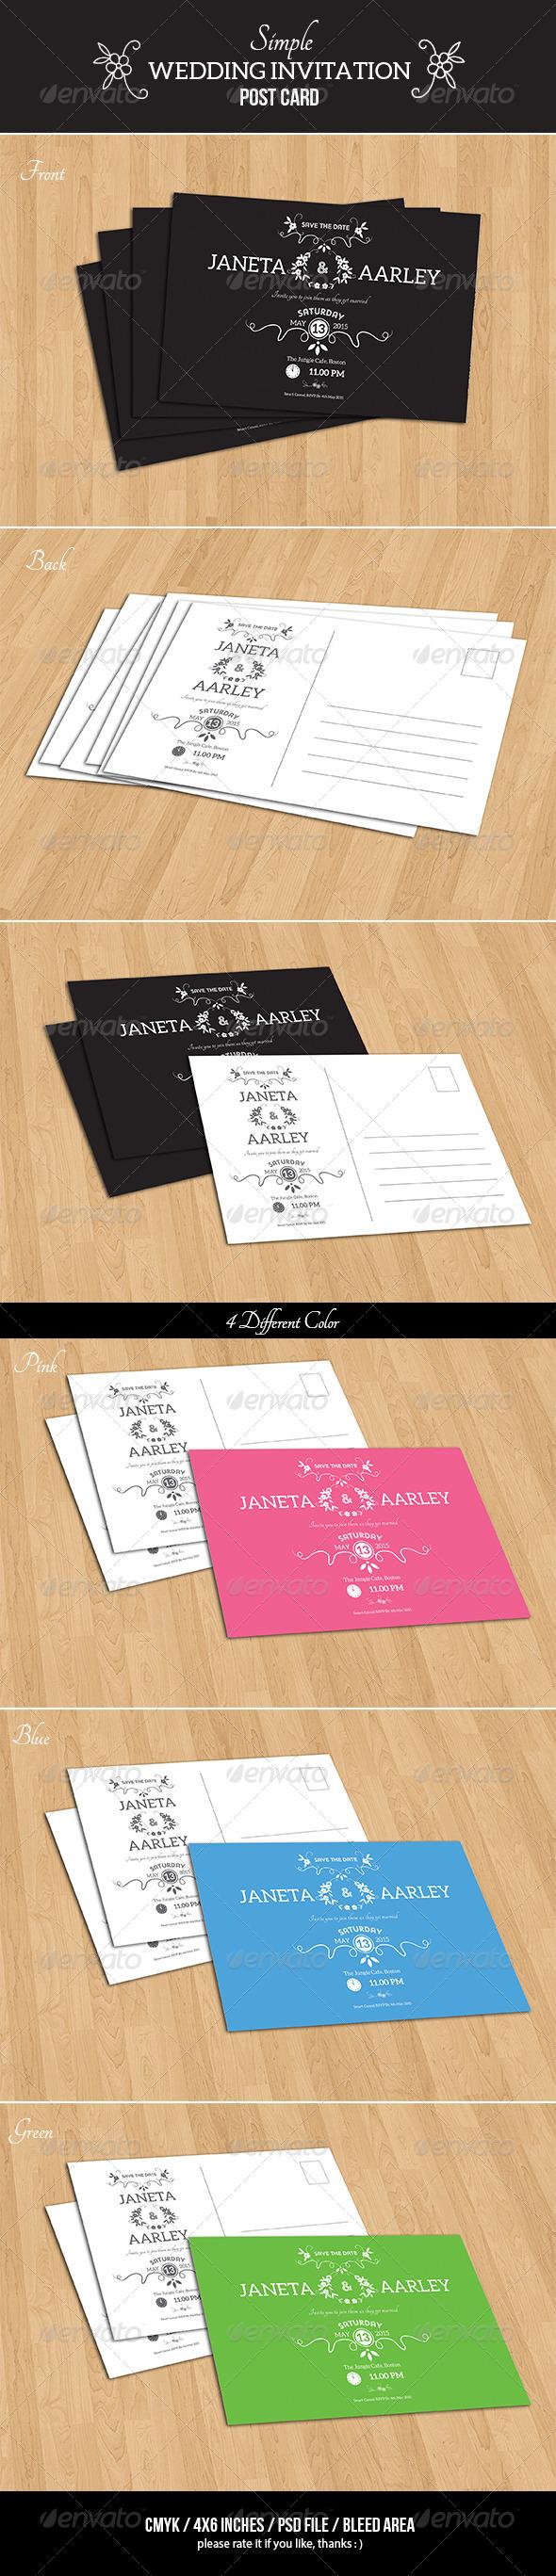 GraphicRiver Simple Wedding Invitation Post Card 7720256